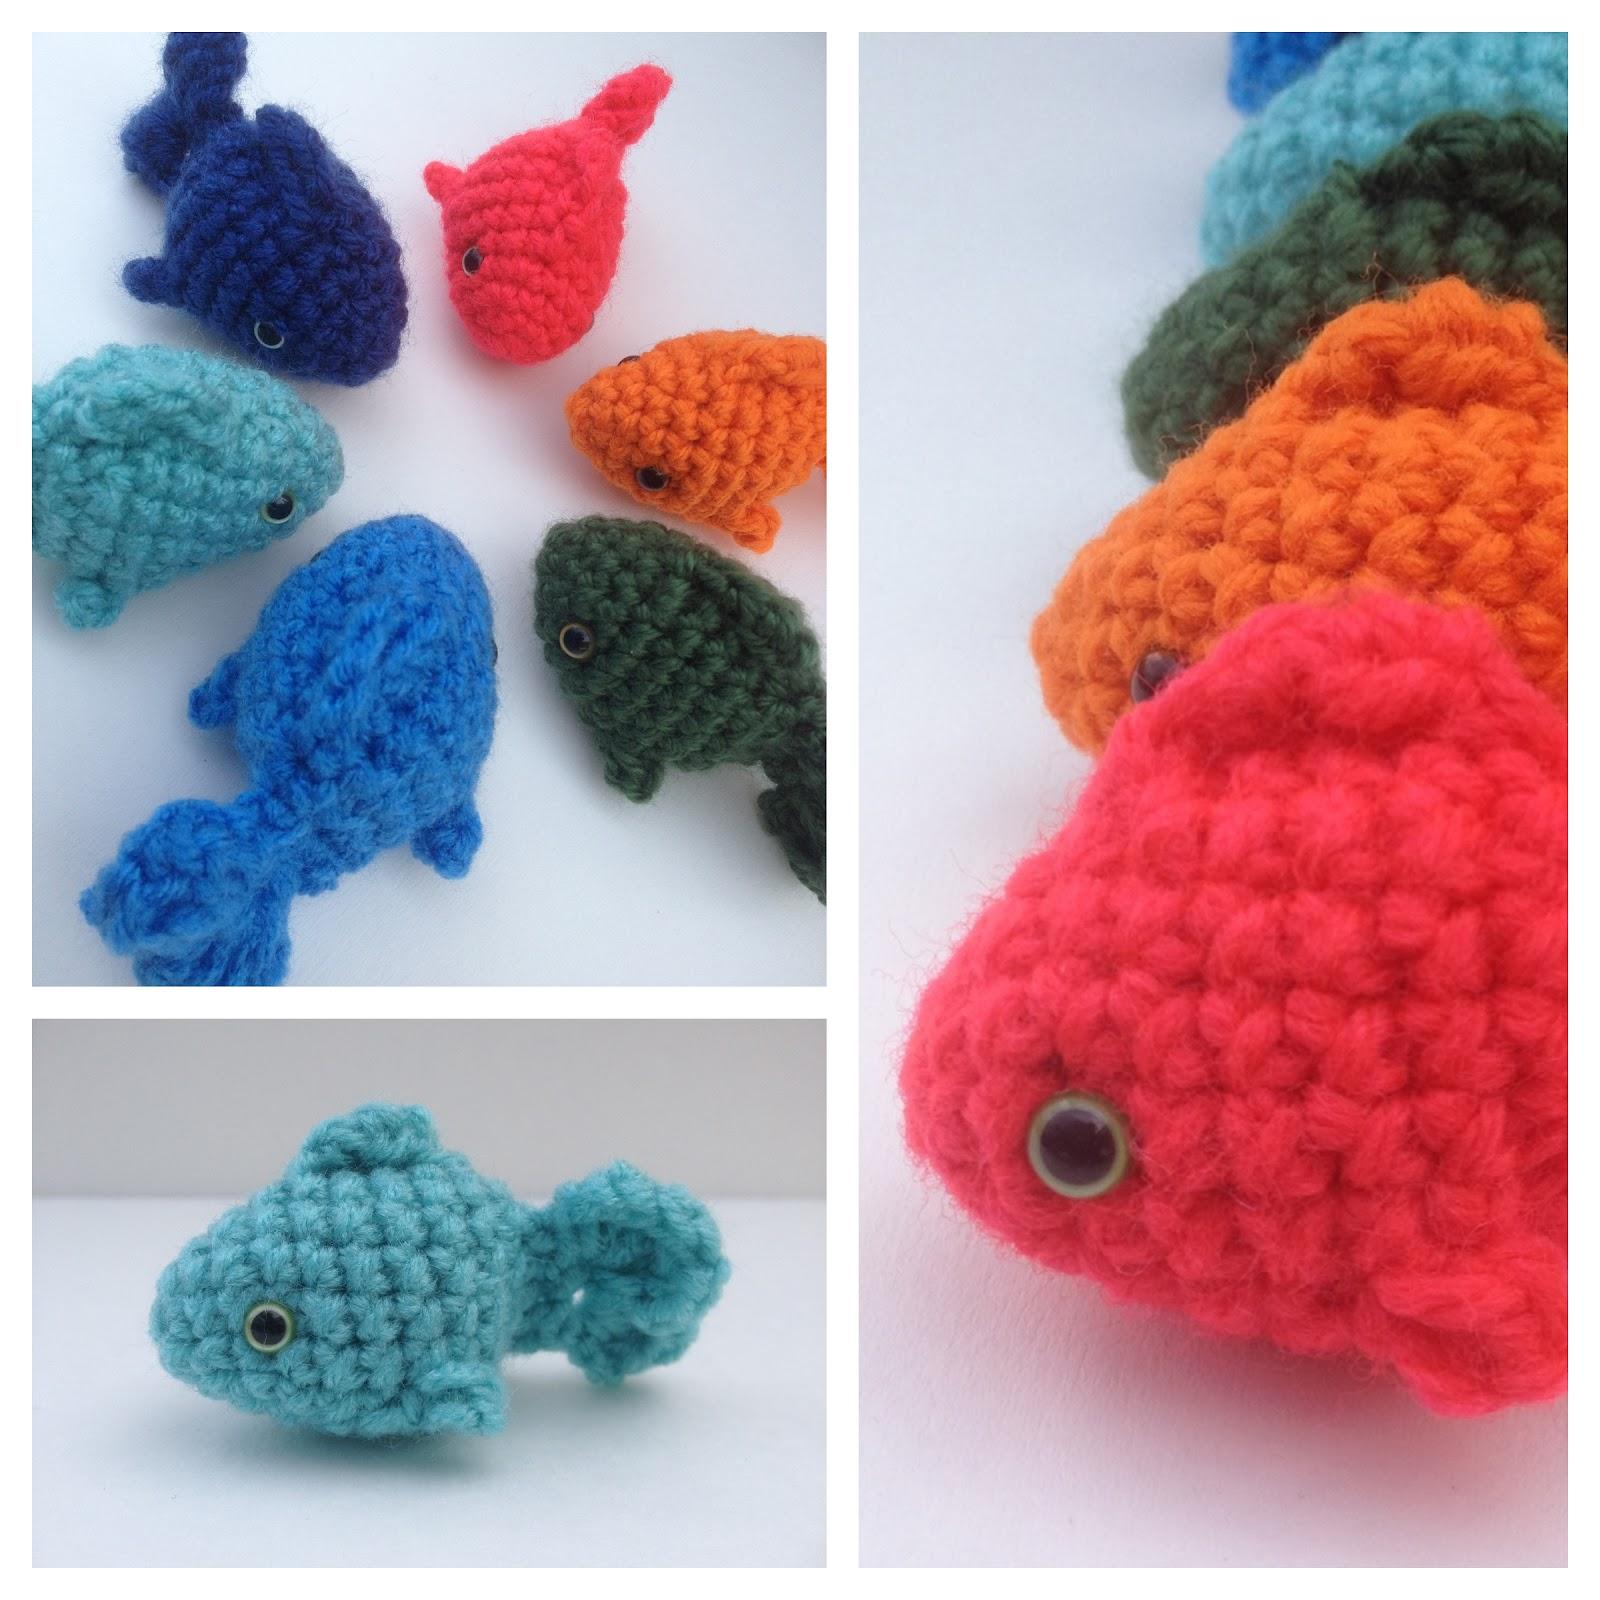 Amigurumi Crochet Fish Pattern : The Itsy Bitsy Spider Crochet: Lil Fishy